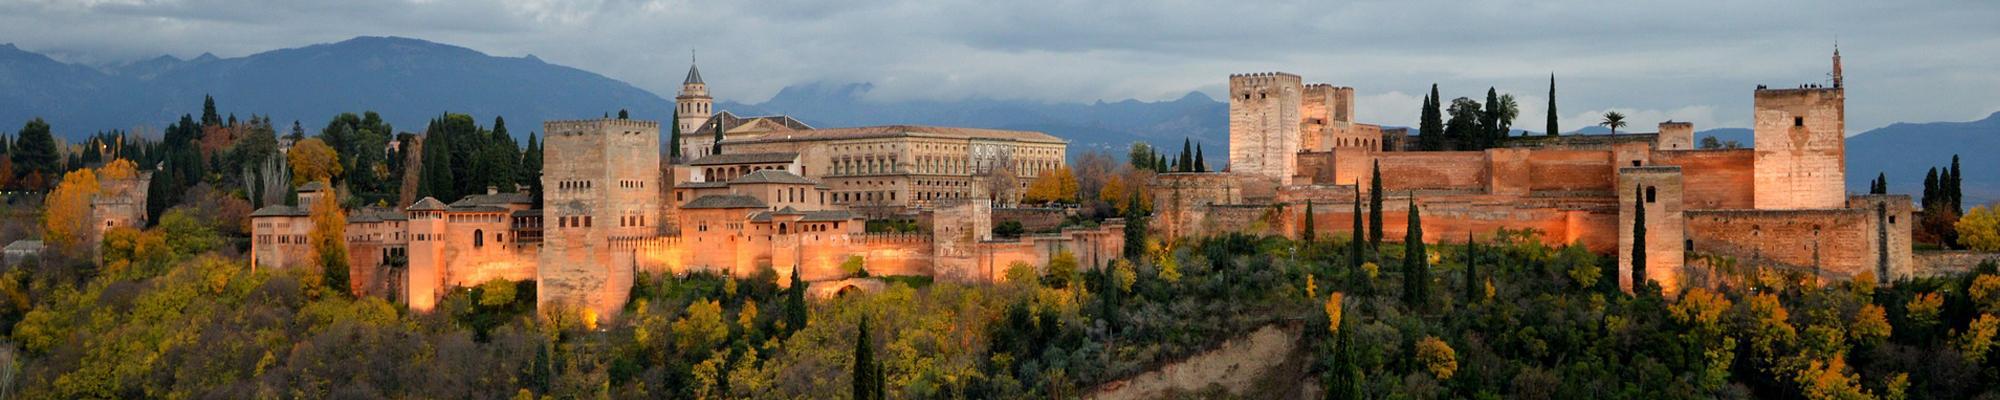 Castle in Alhambra, Spain